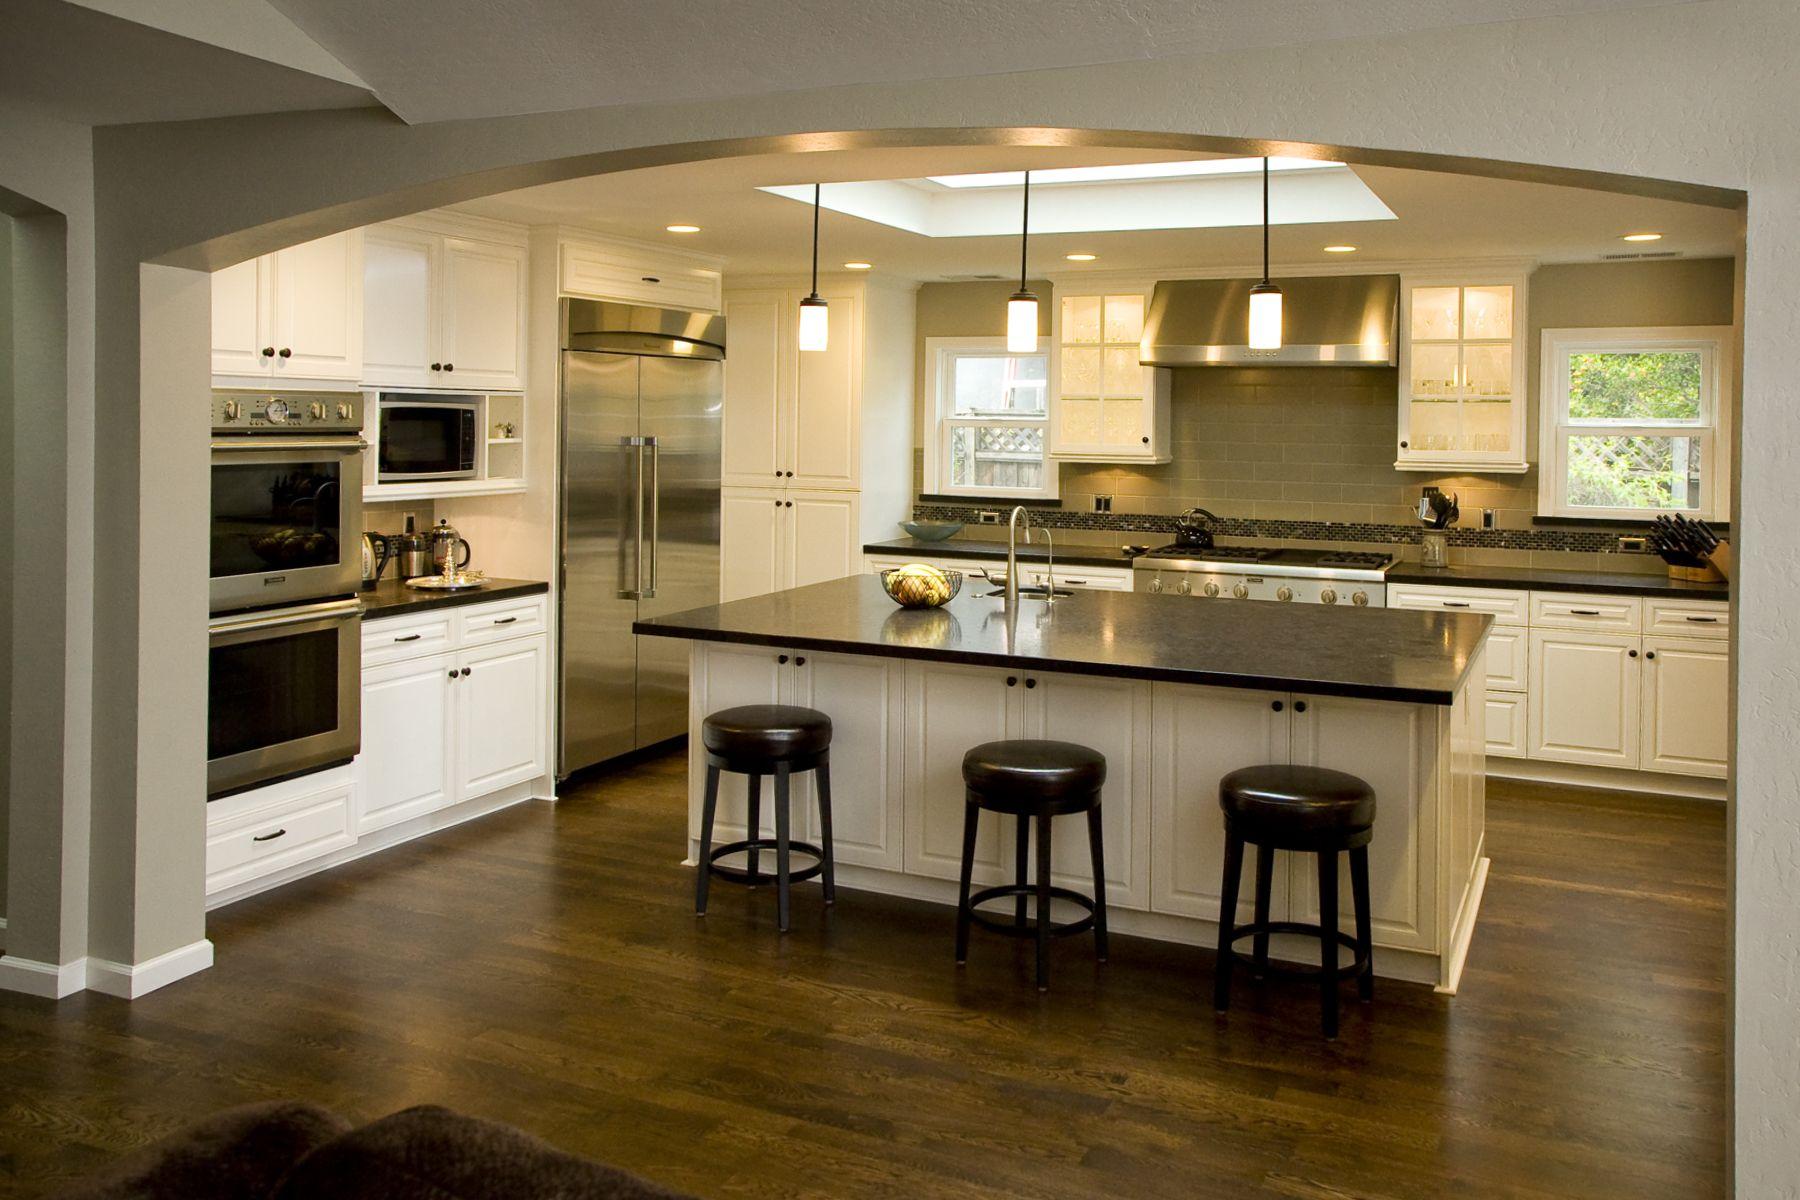 craftsman kitchens craftsman modern kitchen home design and decor reviews kitchens on kitchen cabinets modern contemporary id=80098